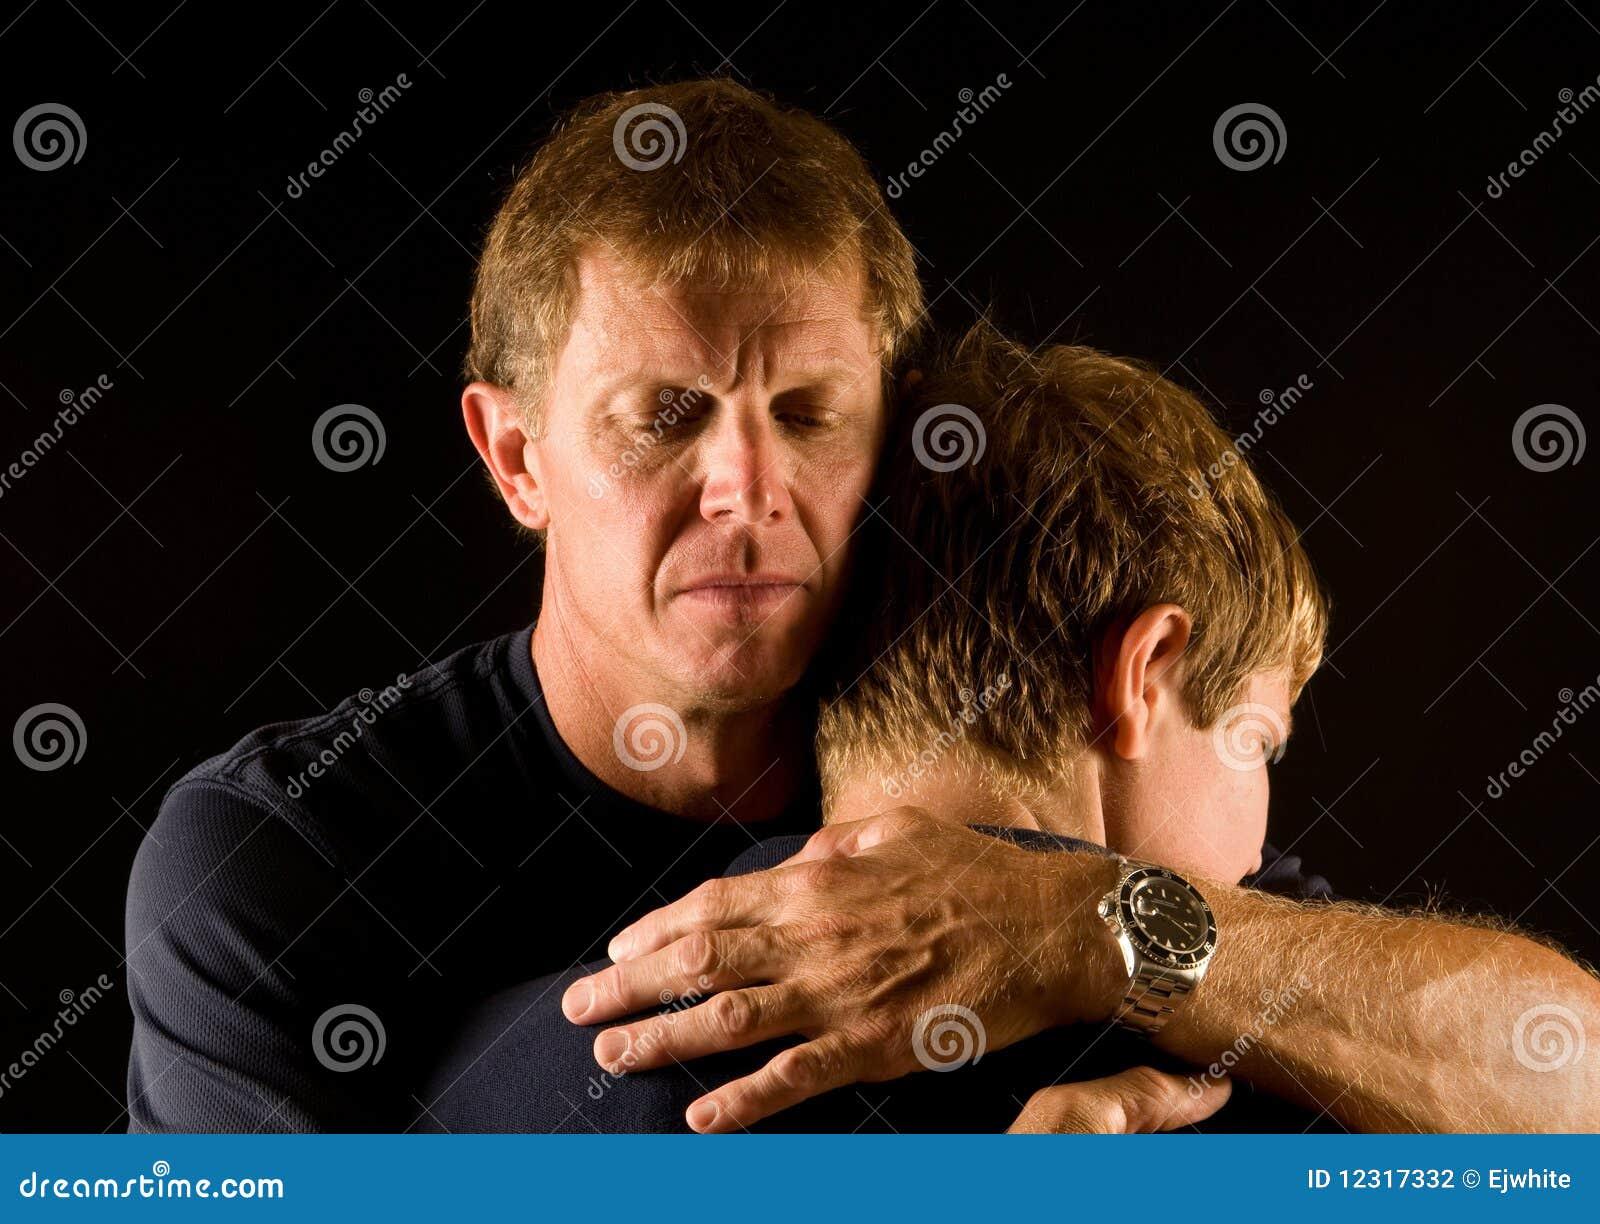 Padre e hijo en abrazo emocional